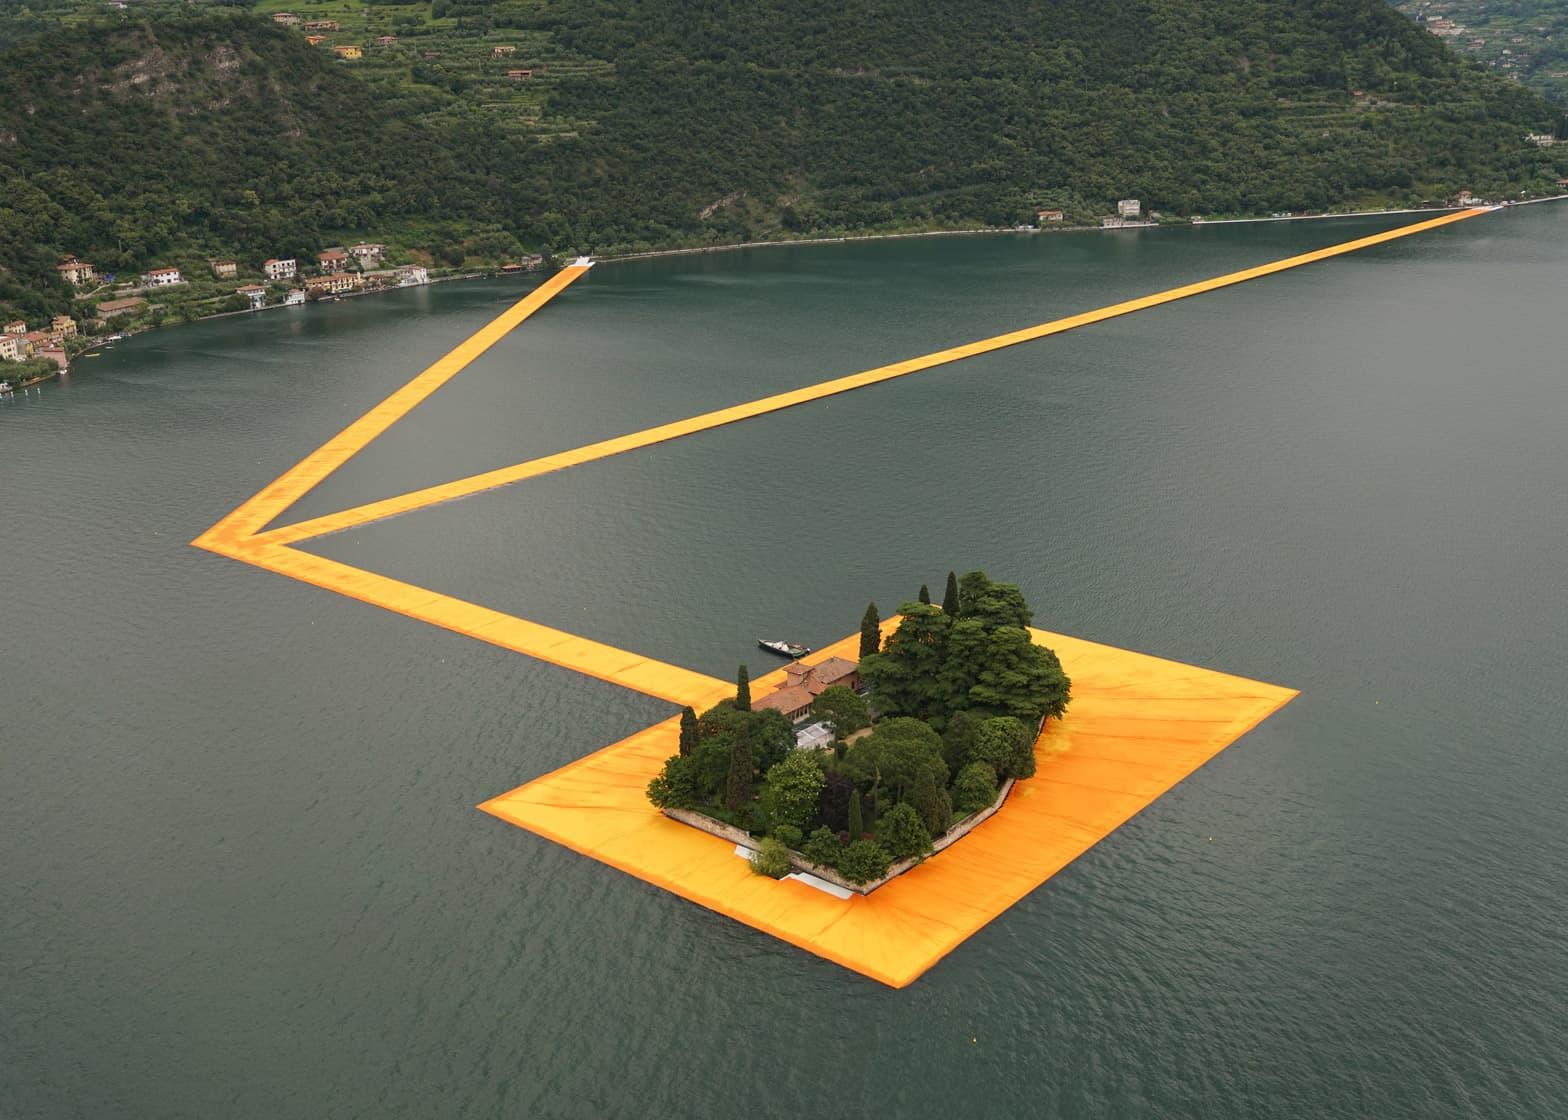 floating-piers-christo-lake-iseo-italy-june-2016-orange-yellow-fabric-birds-eye_dezeen_1568_7